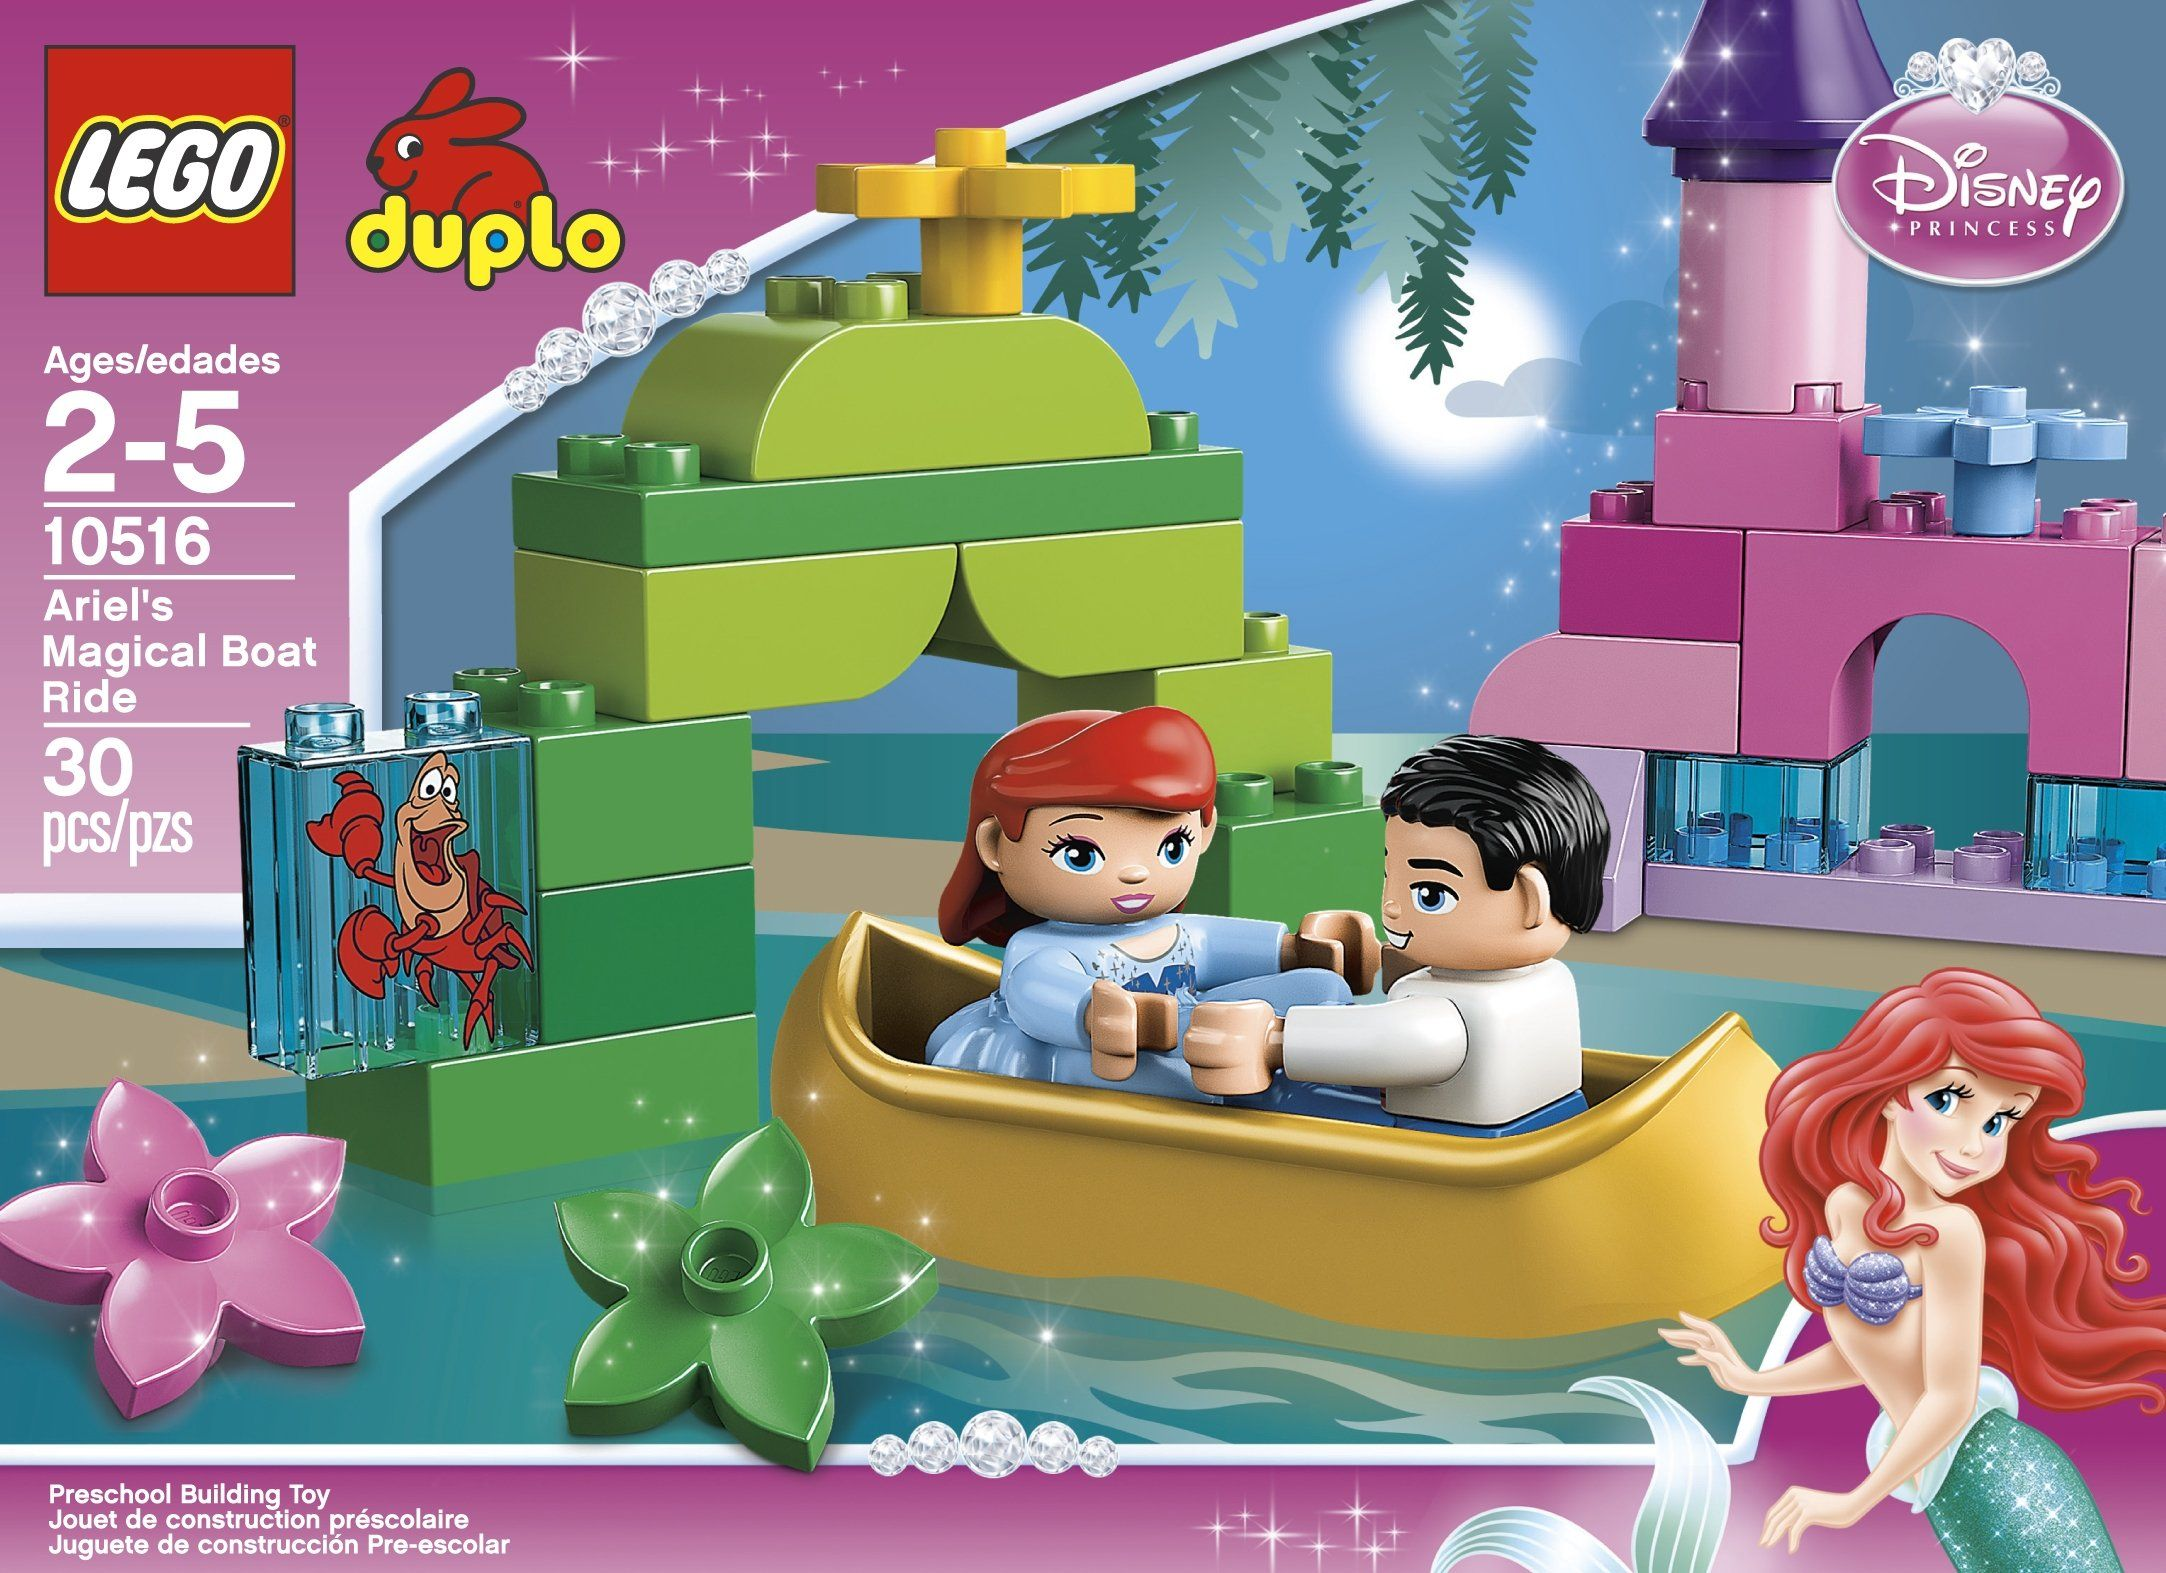 Disney Princess Ariel Lego Collections Lego Duplo Duplo Lego Disney